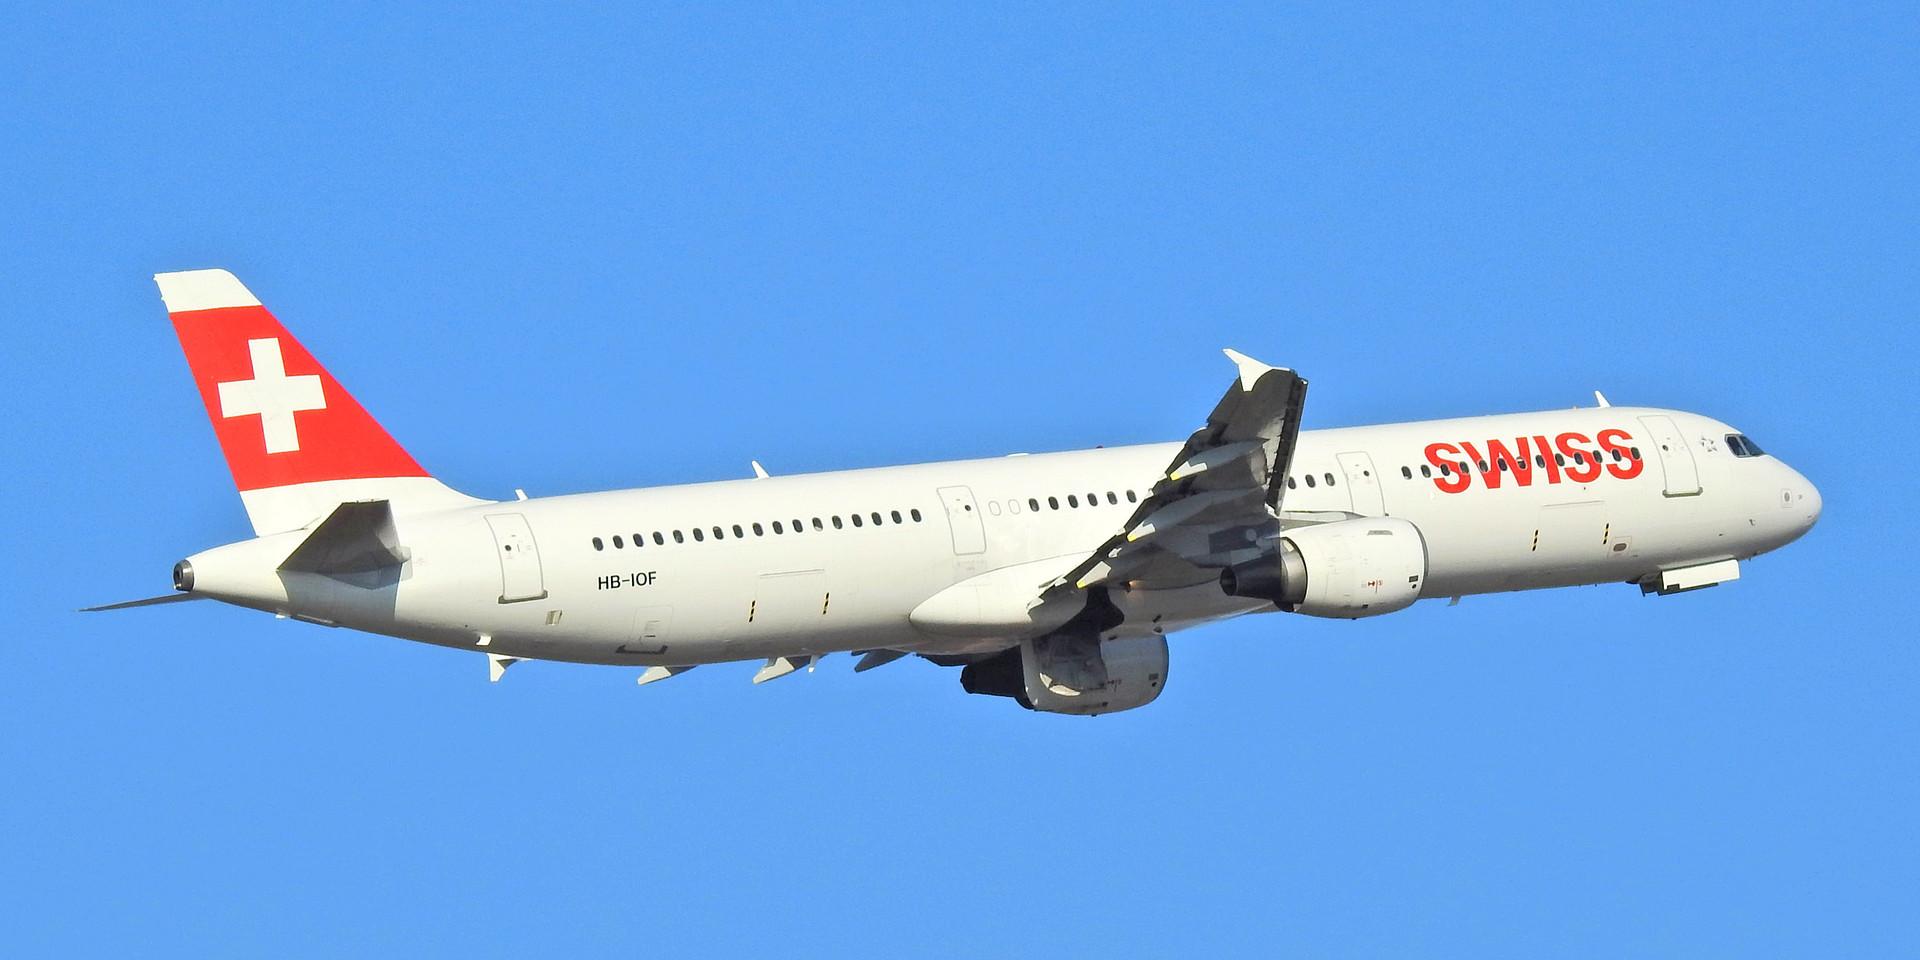 321 LX HB-IOF GVA 200120 (4).jpg